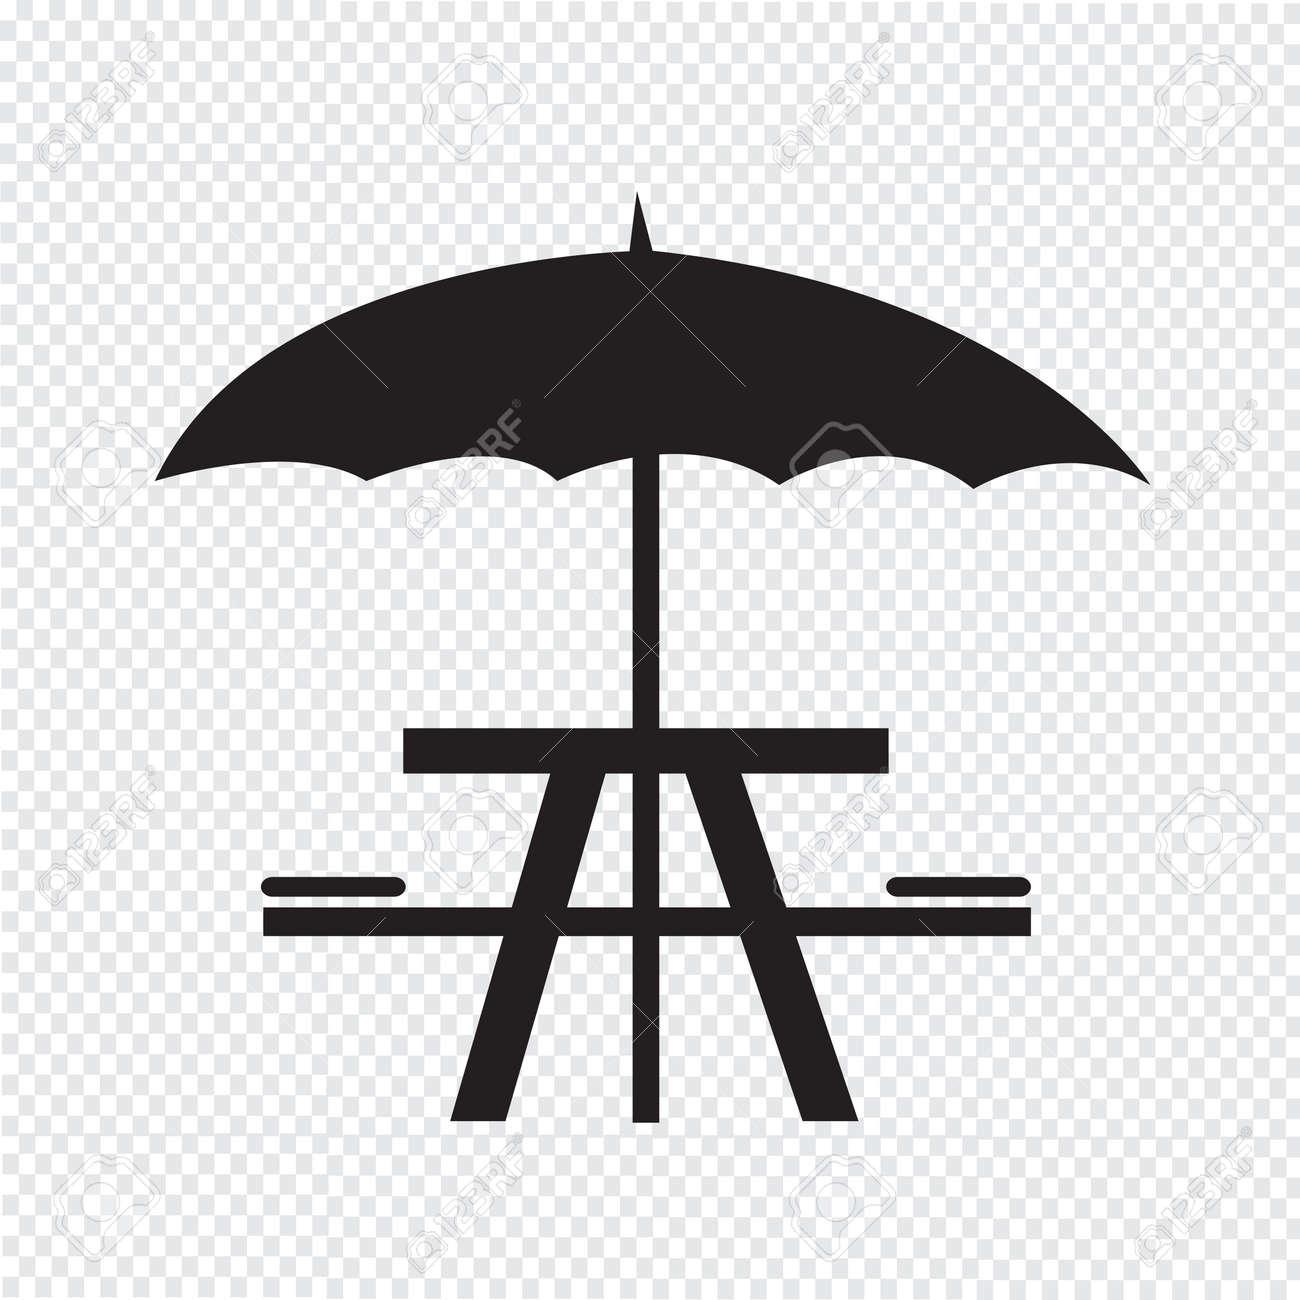 Umbrella with picnic table icon royalty free cliparts vectors umbrella with picnic table icon stock vector 39177796 biocorpaavc